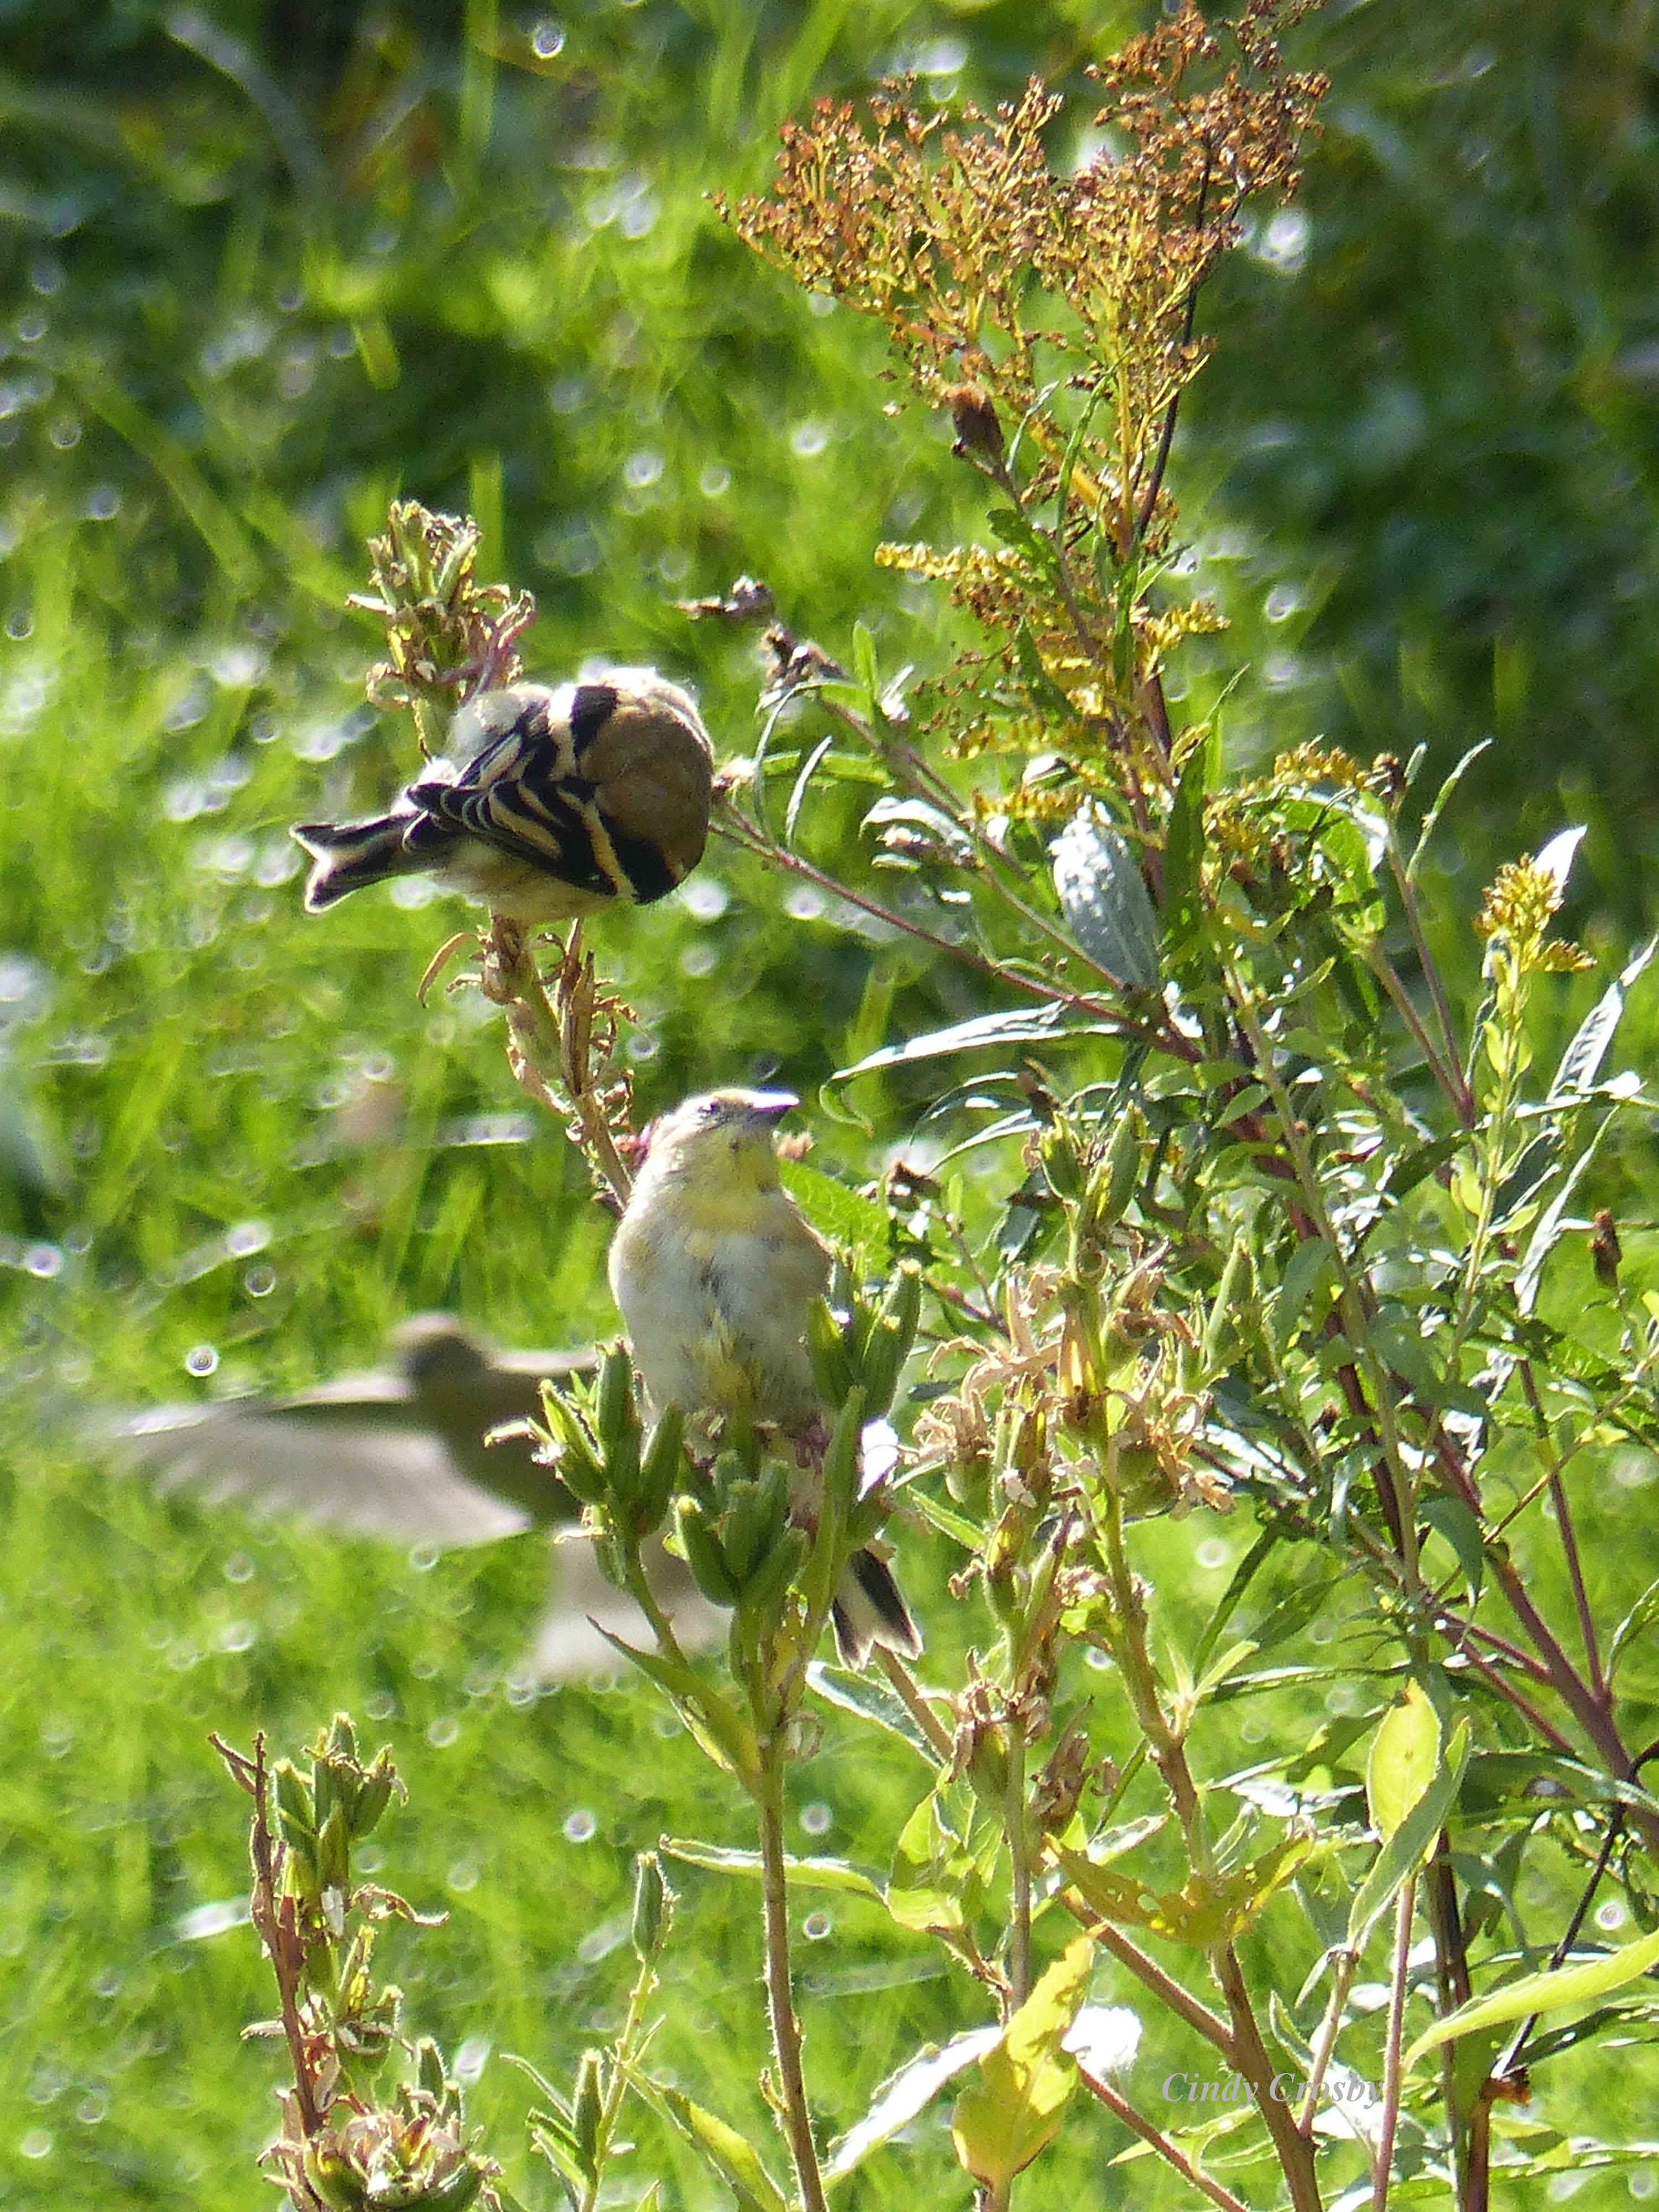 goldfinchesGEbackyardSeptemberWM.jpg